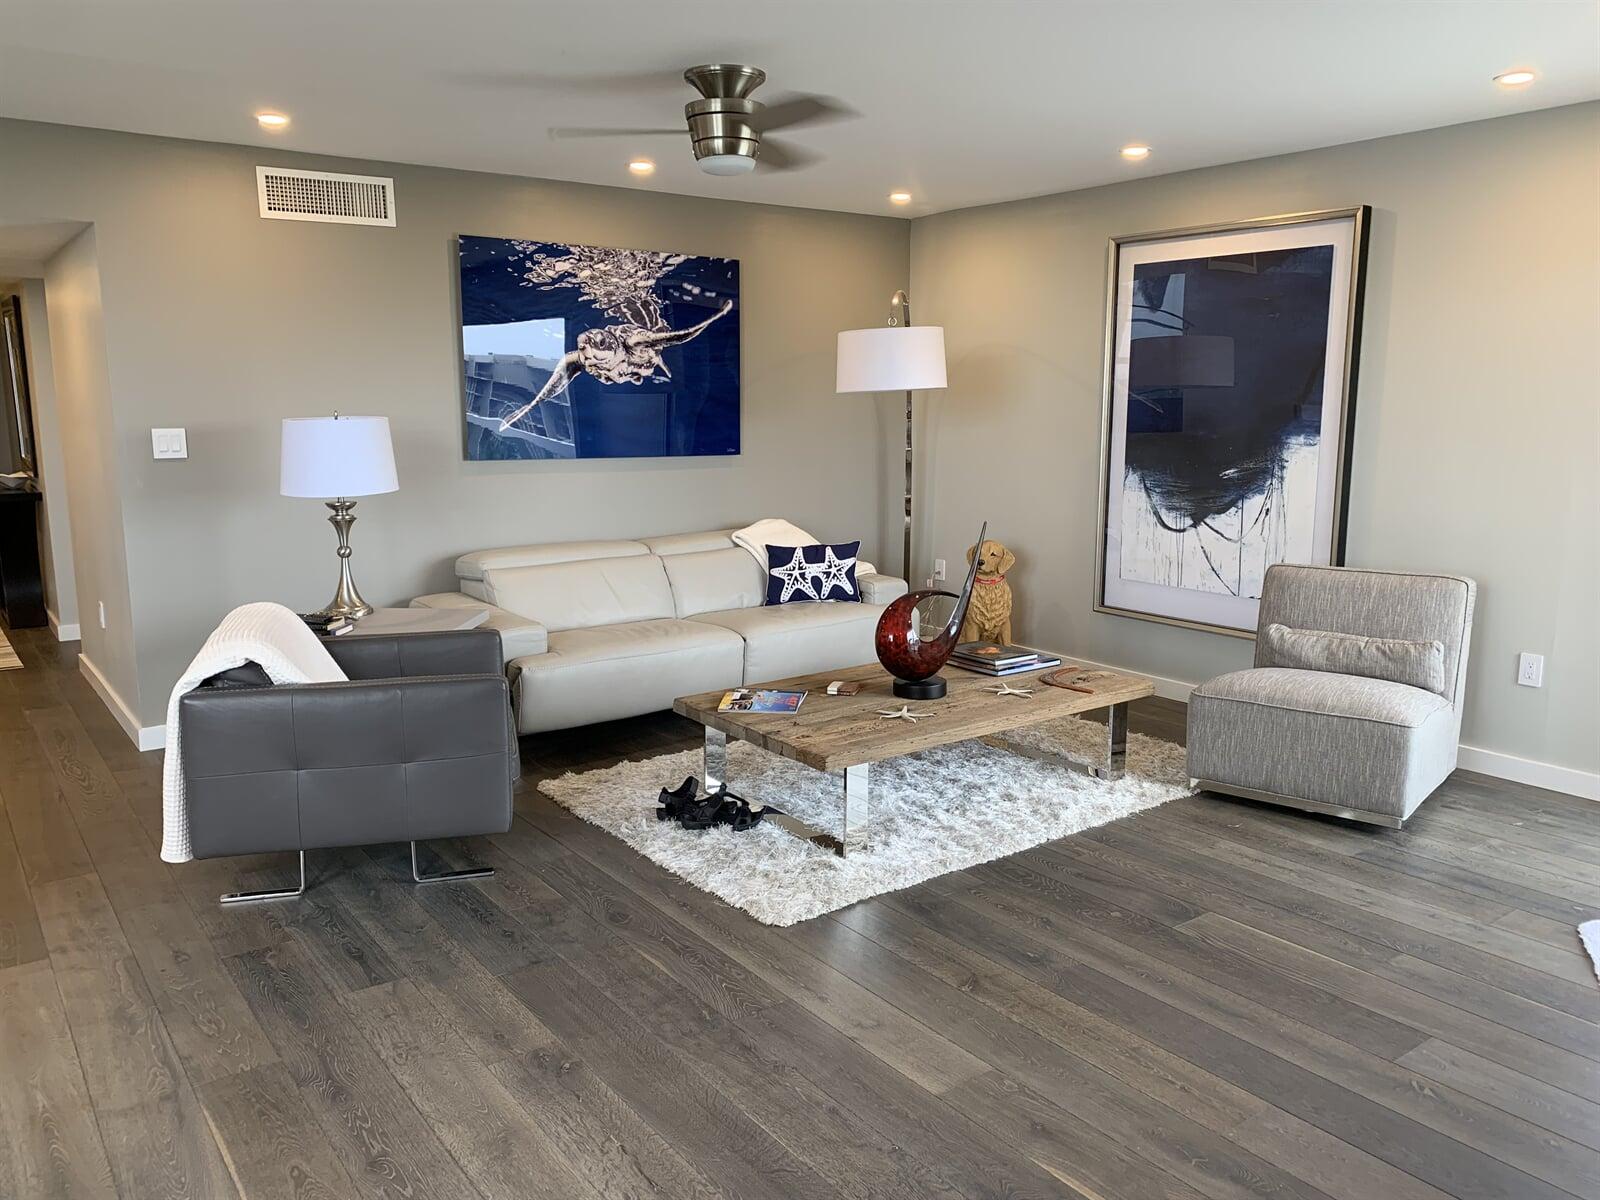 Specialty & Custom Flooring Work in Siesta Key, FL from Floors and Walls of Distinction